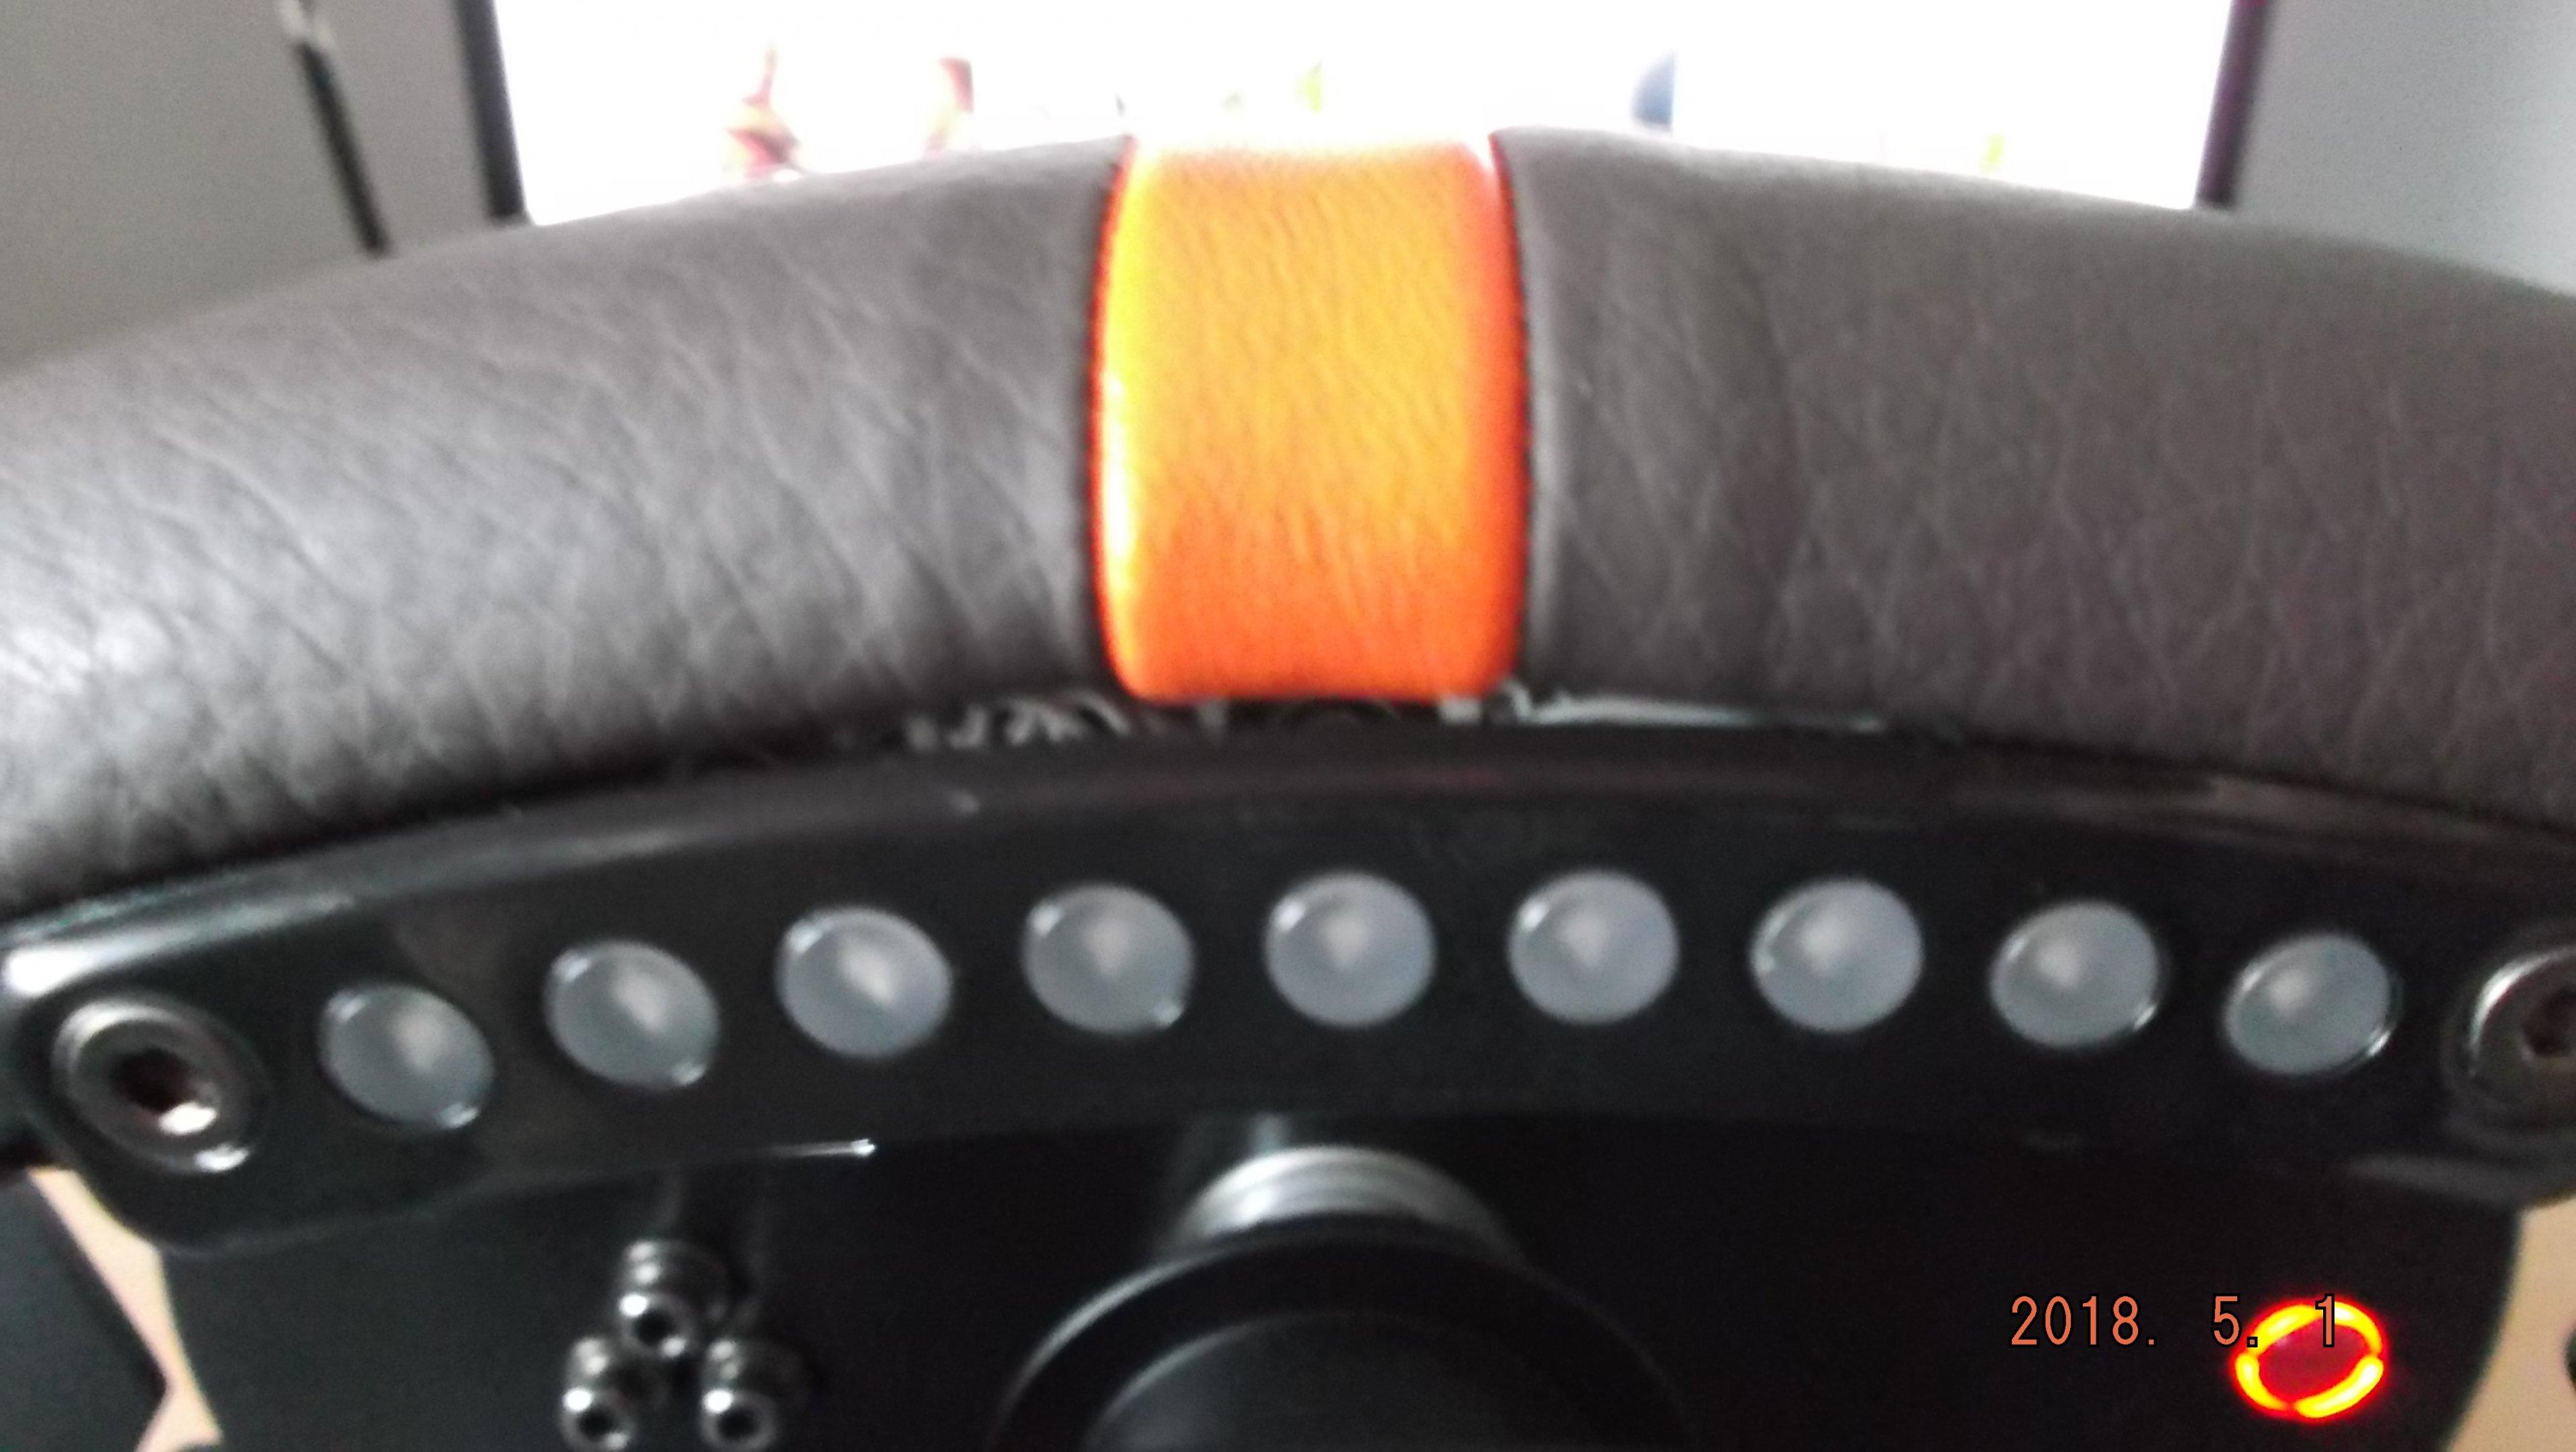 fanatec porsche 918 rsr wheel.jpg